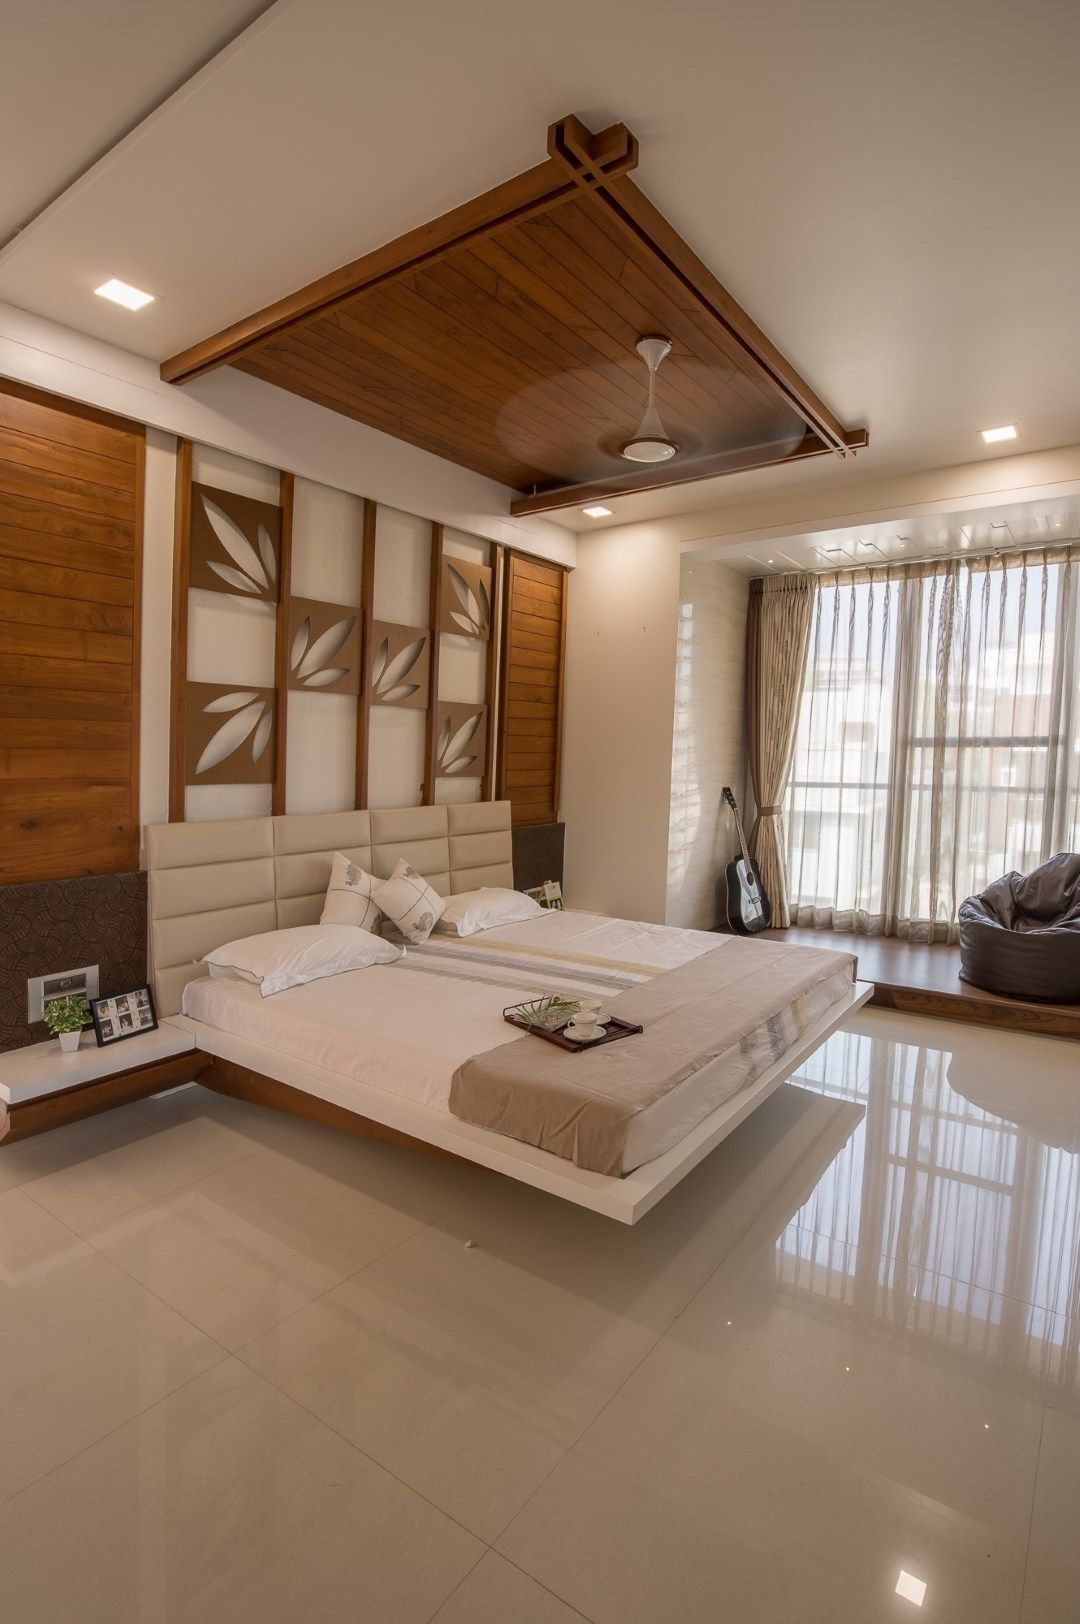 26 Unordinary Bedroom Design Ideas In 2020 Amazing Bedroom Designs Modern Bedroom Decor Modern Bedroom Interior